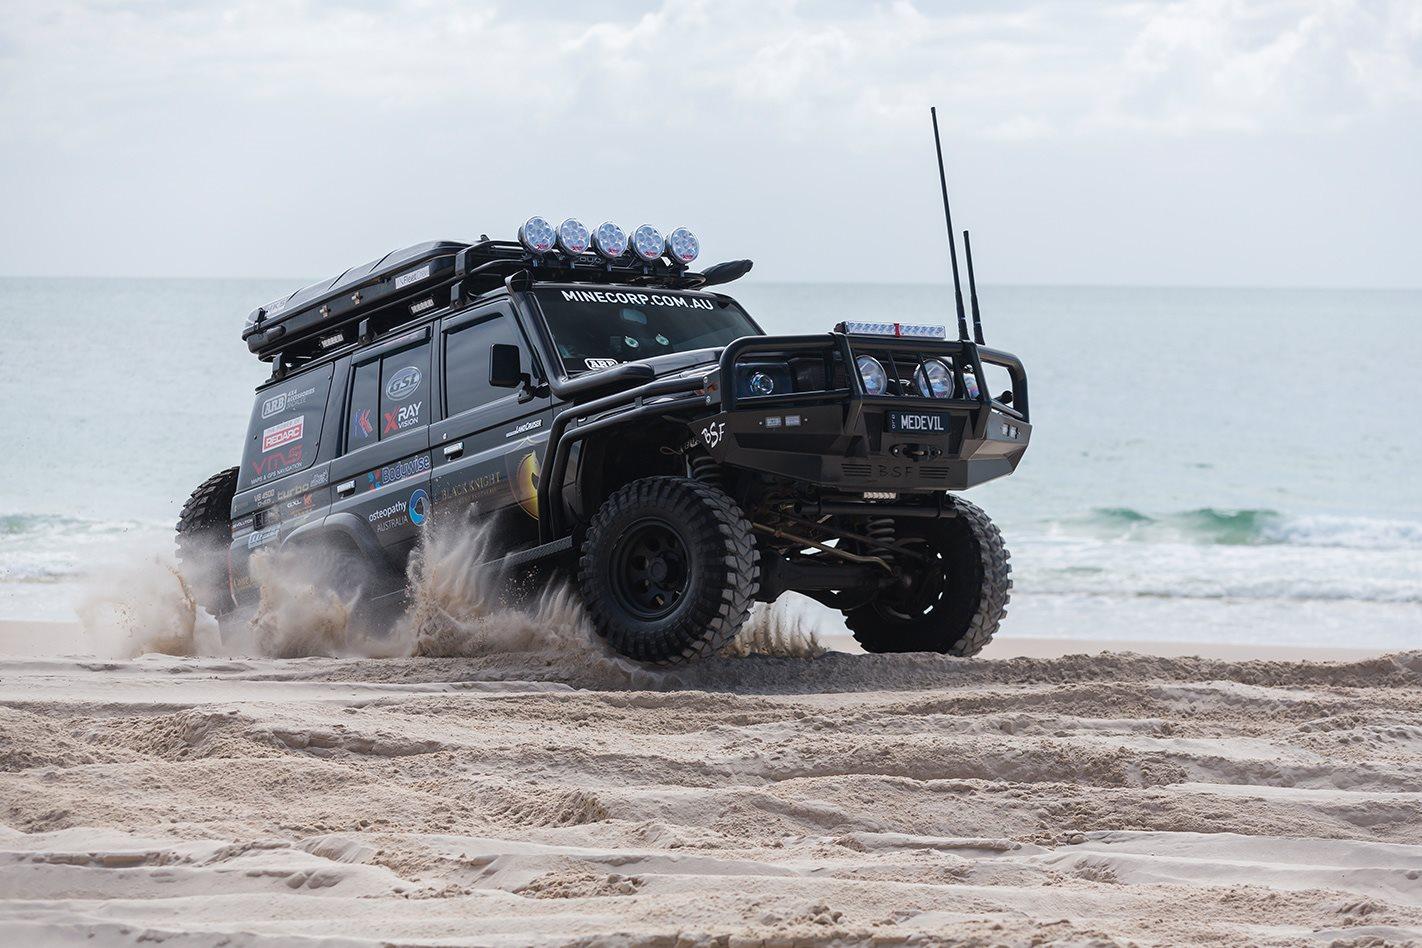 Video Custom Toyota Landcruiser Vdj76r 4x4 Australia